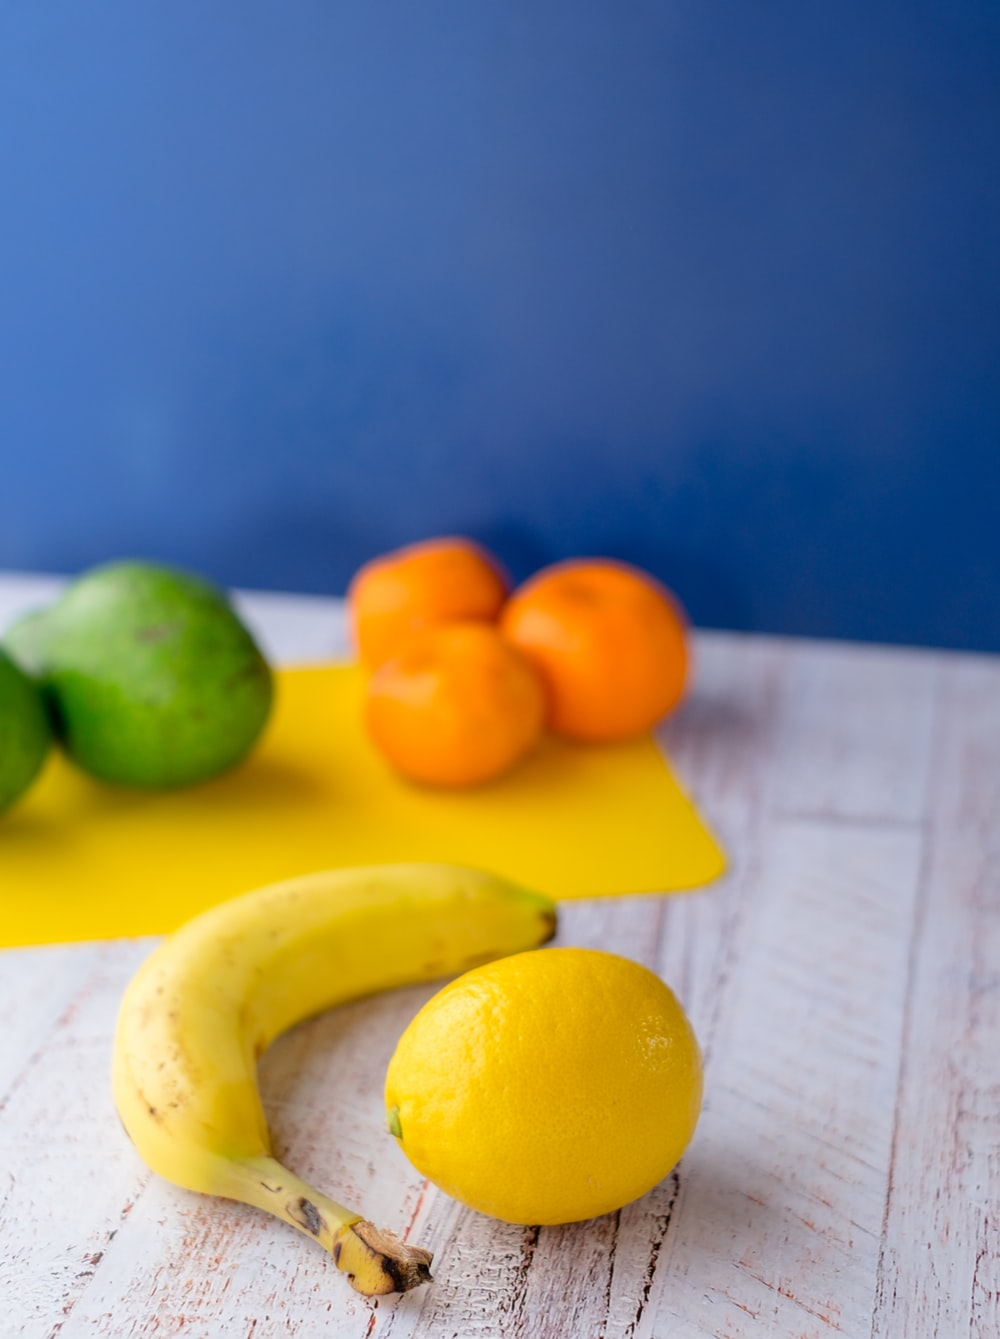 lemon and banana fruits